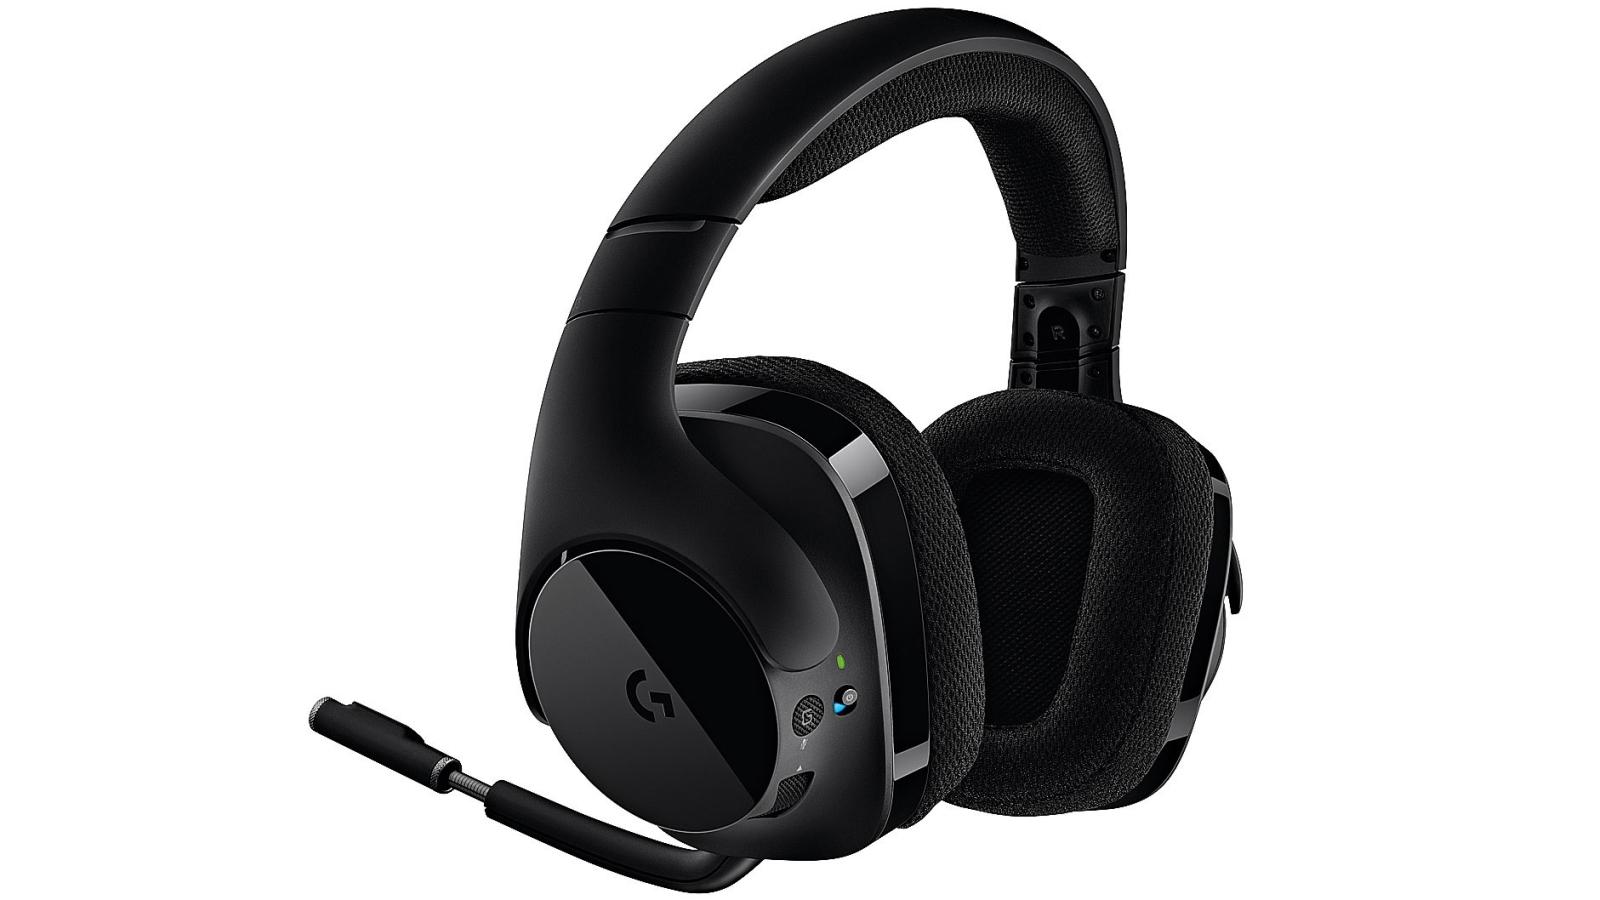 4f627eb3583 Buy Logitech G533 Wireless DTS 7.1 Surround Wireless Gaming Headset |  Harvey Norman AU